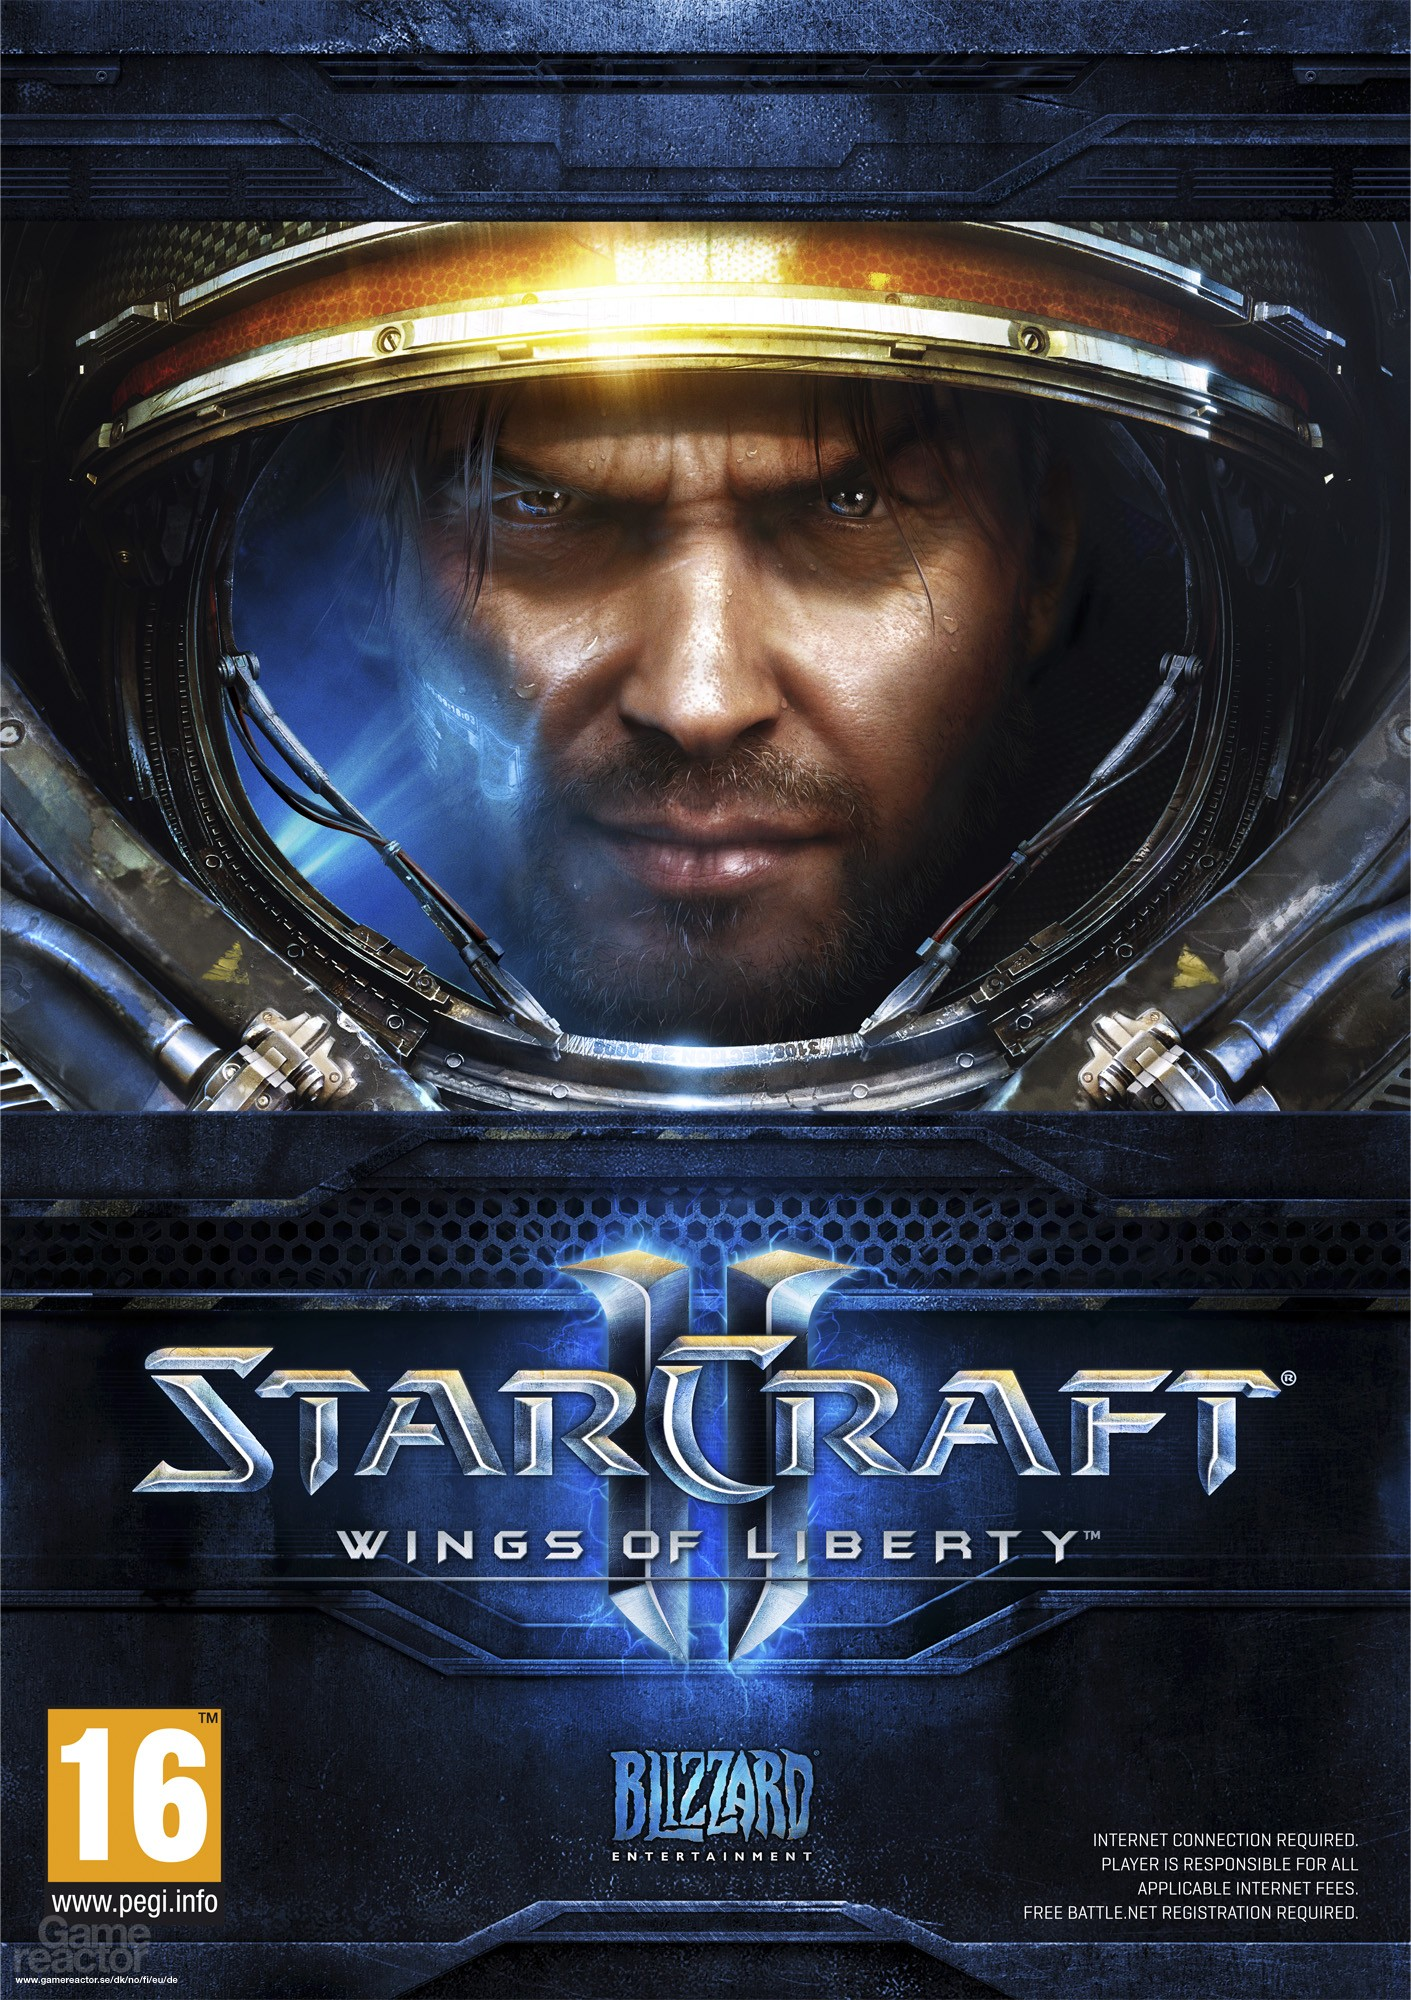 StarCraft 2 Wings of Liberty (2010/RUS/Repack) .